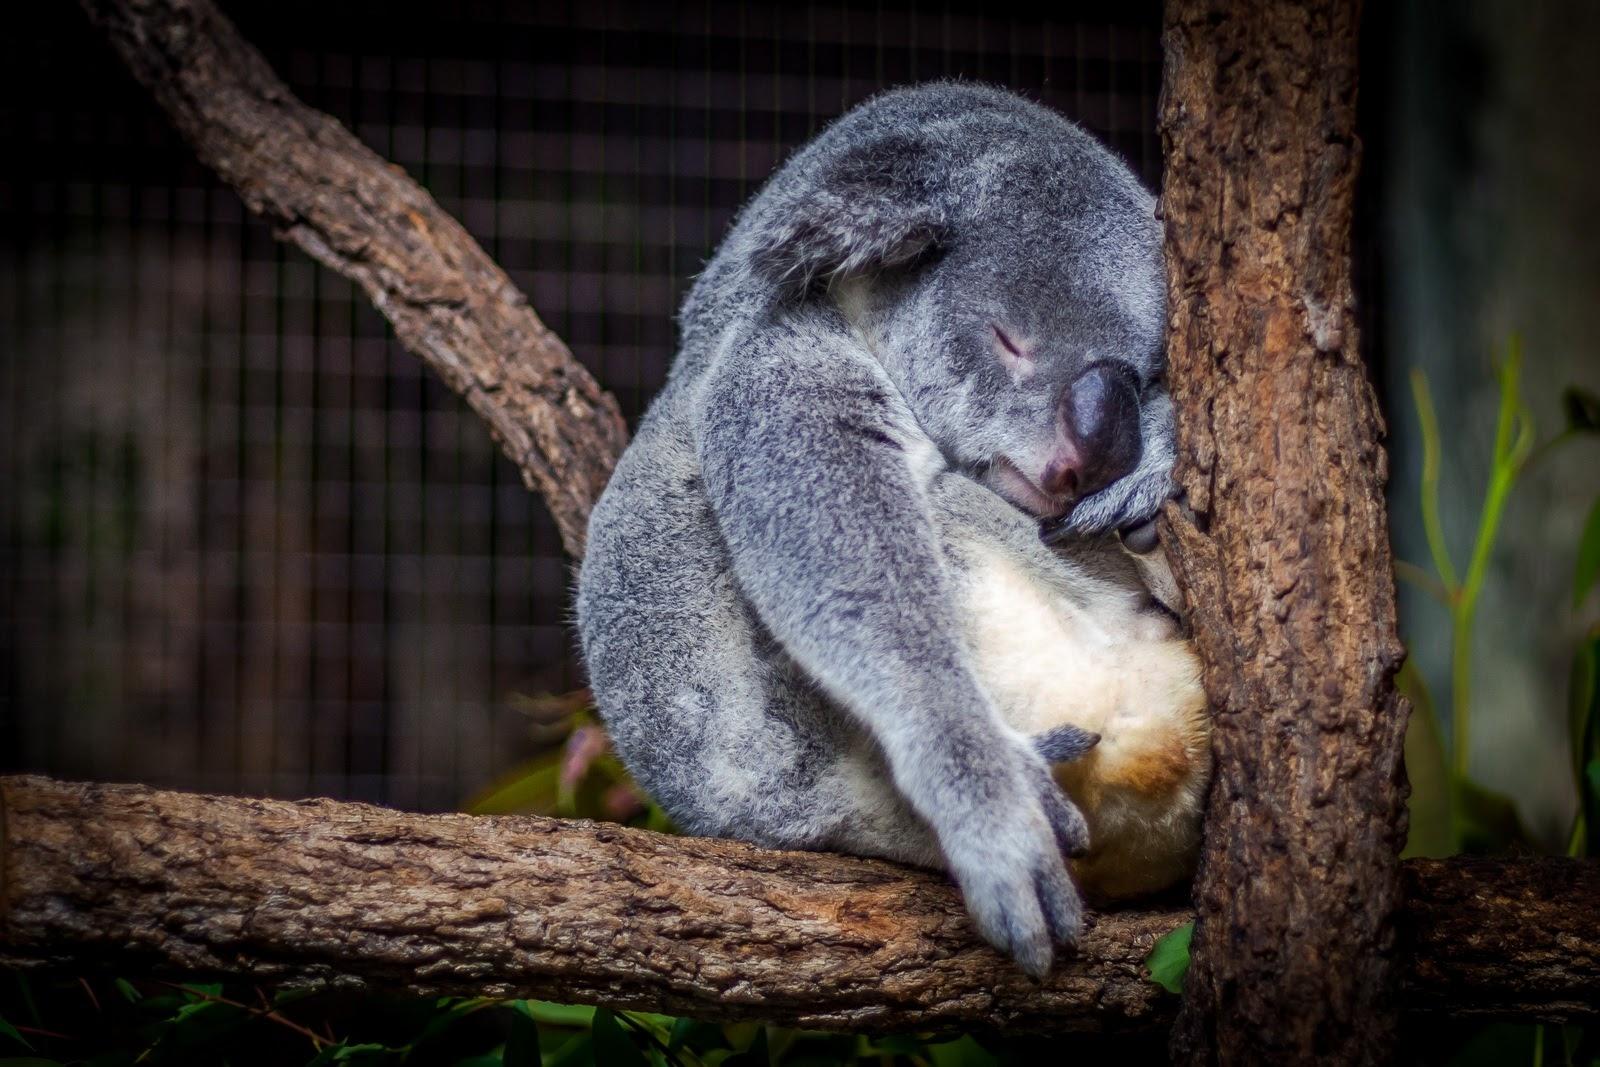 Koala Sleeping in the Tree | Photo by Cris Saur via Unsplash